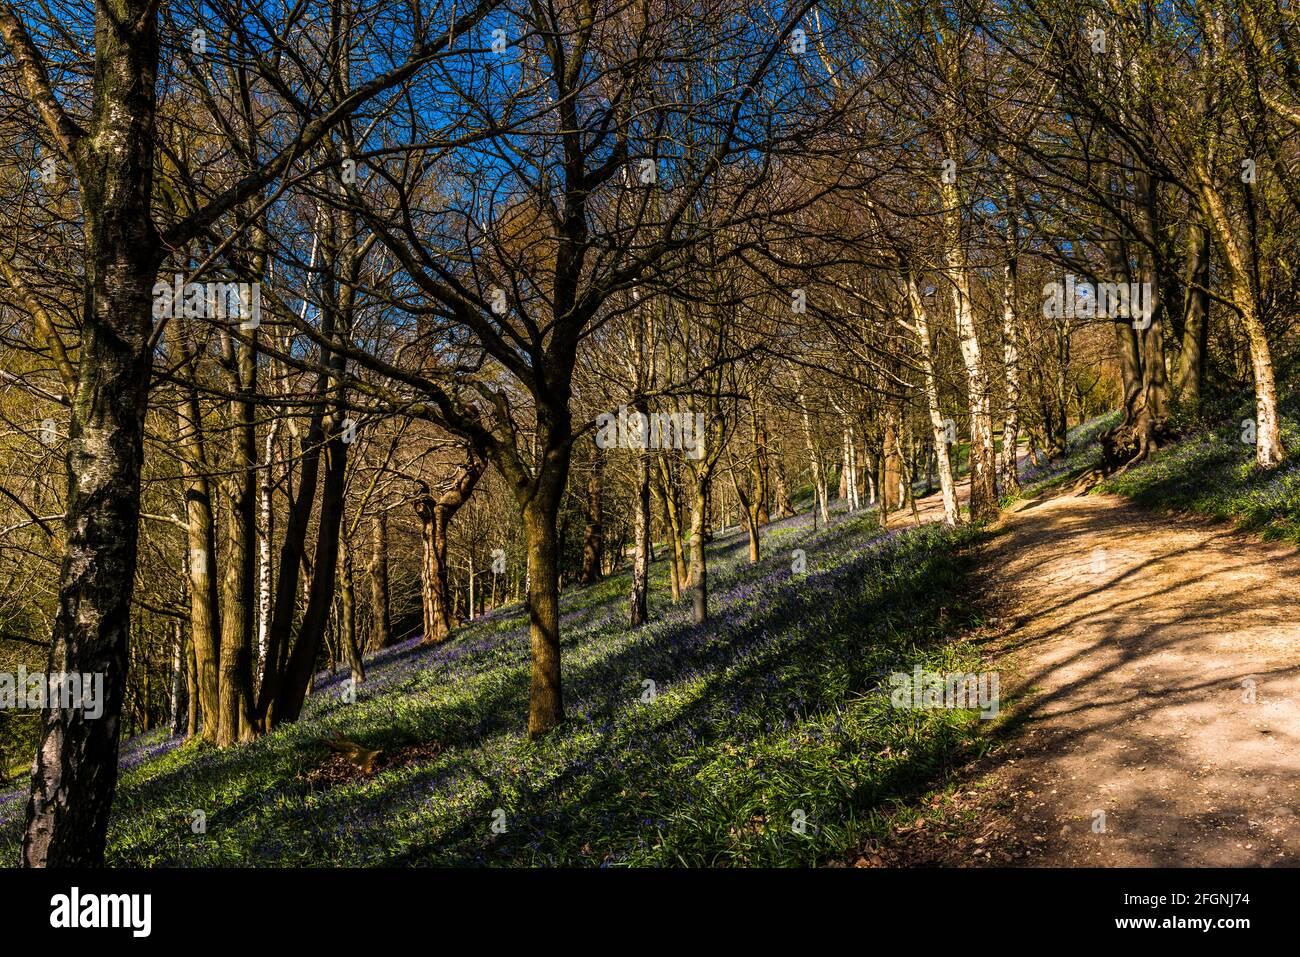 Camino a través de un bosque de cañas en primavera, Emmetts Garden, Kent, Reino Unido Foto de stock